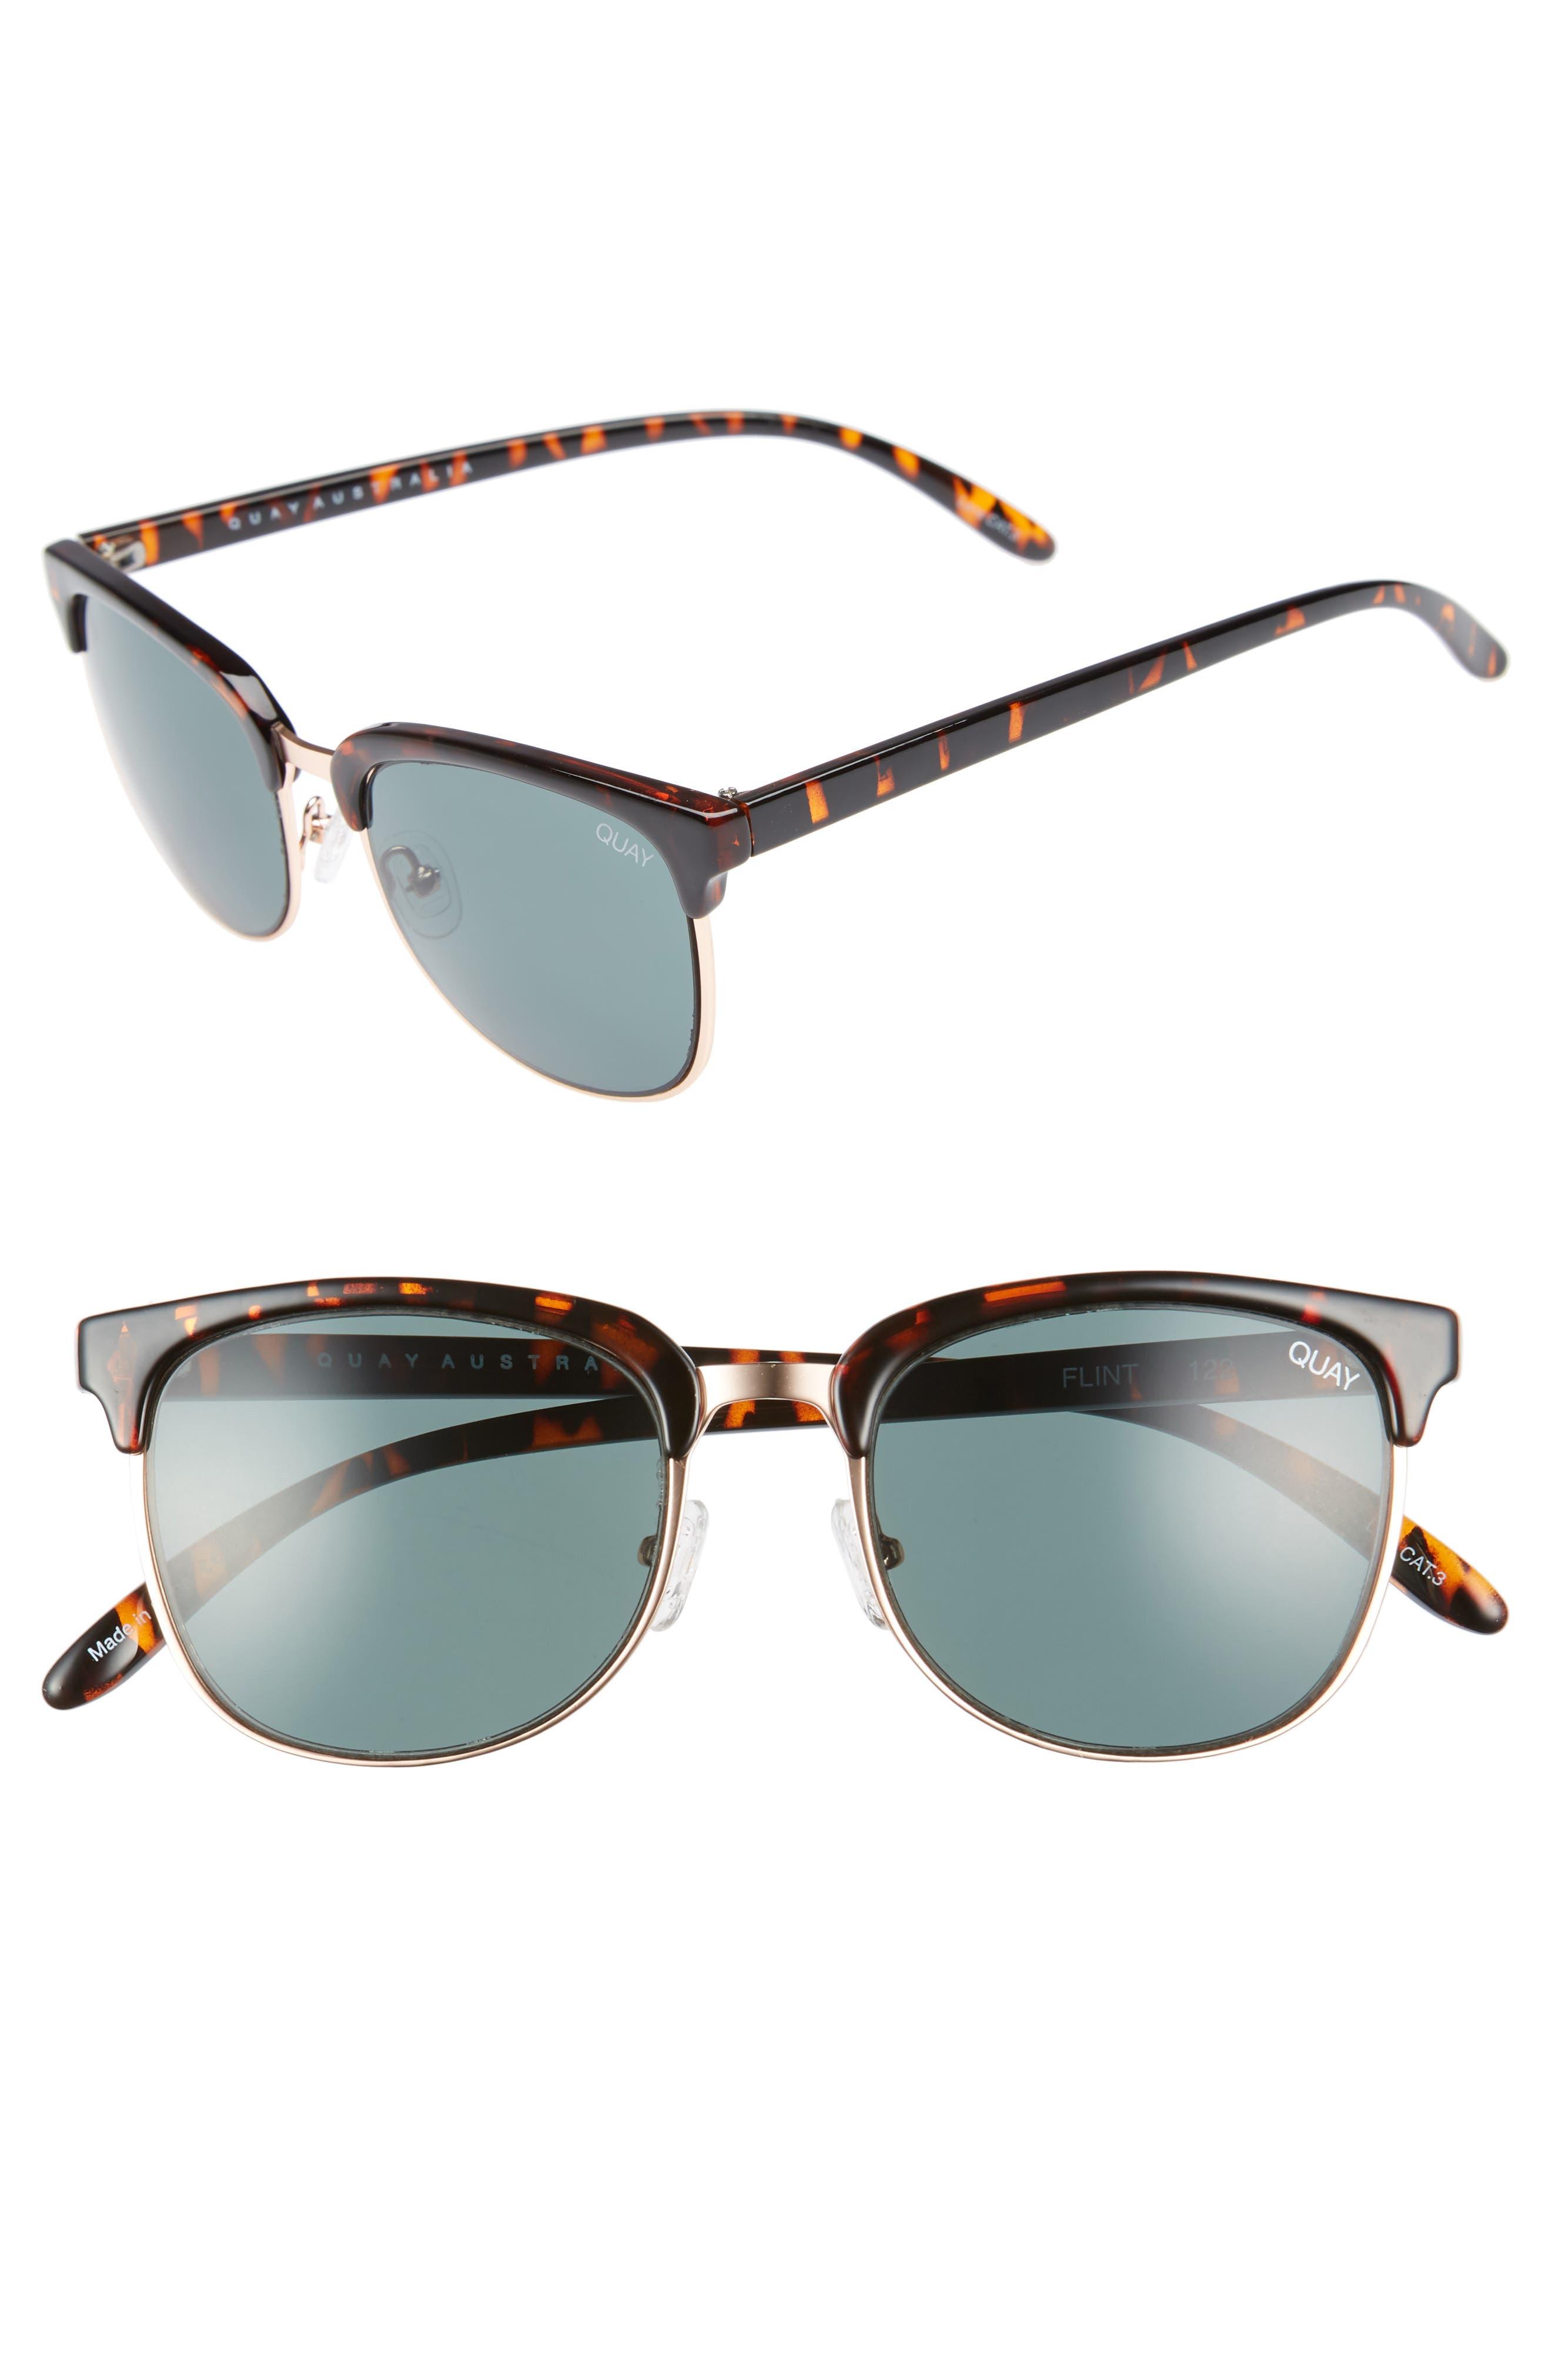 Flint 52mm Sunglasses,                             Main thumbnail 1, color,                             200